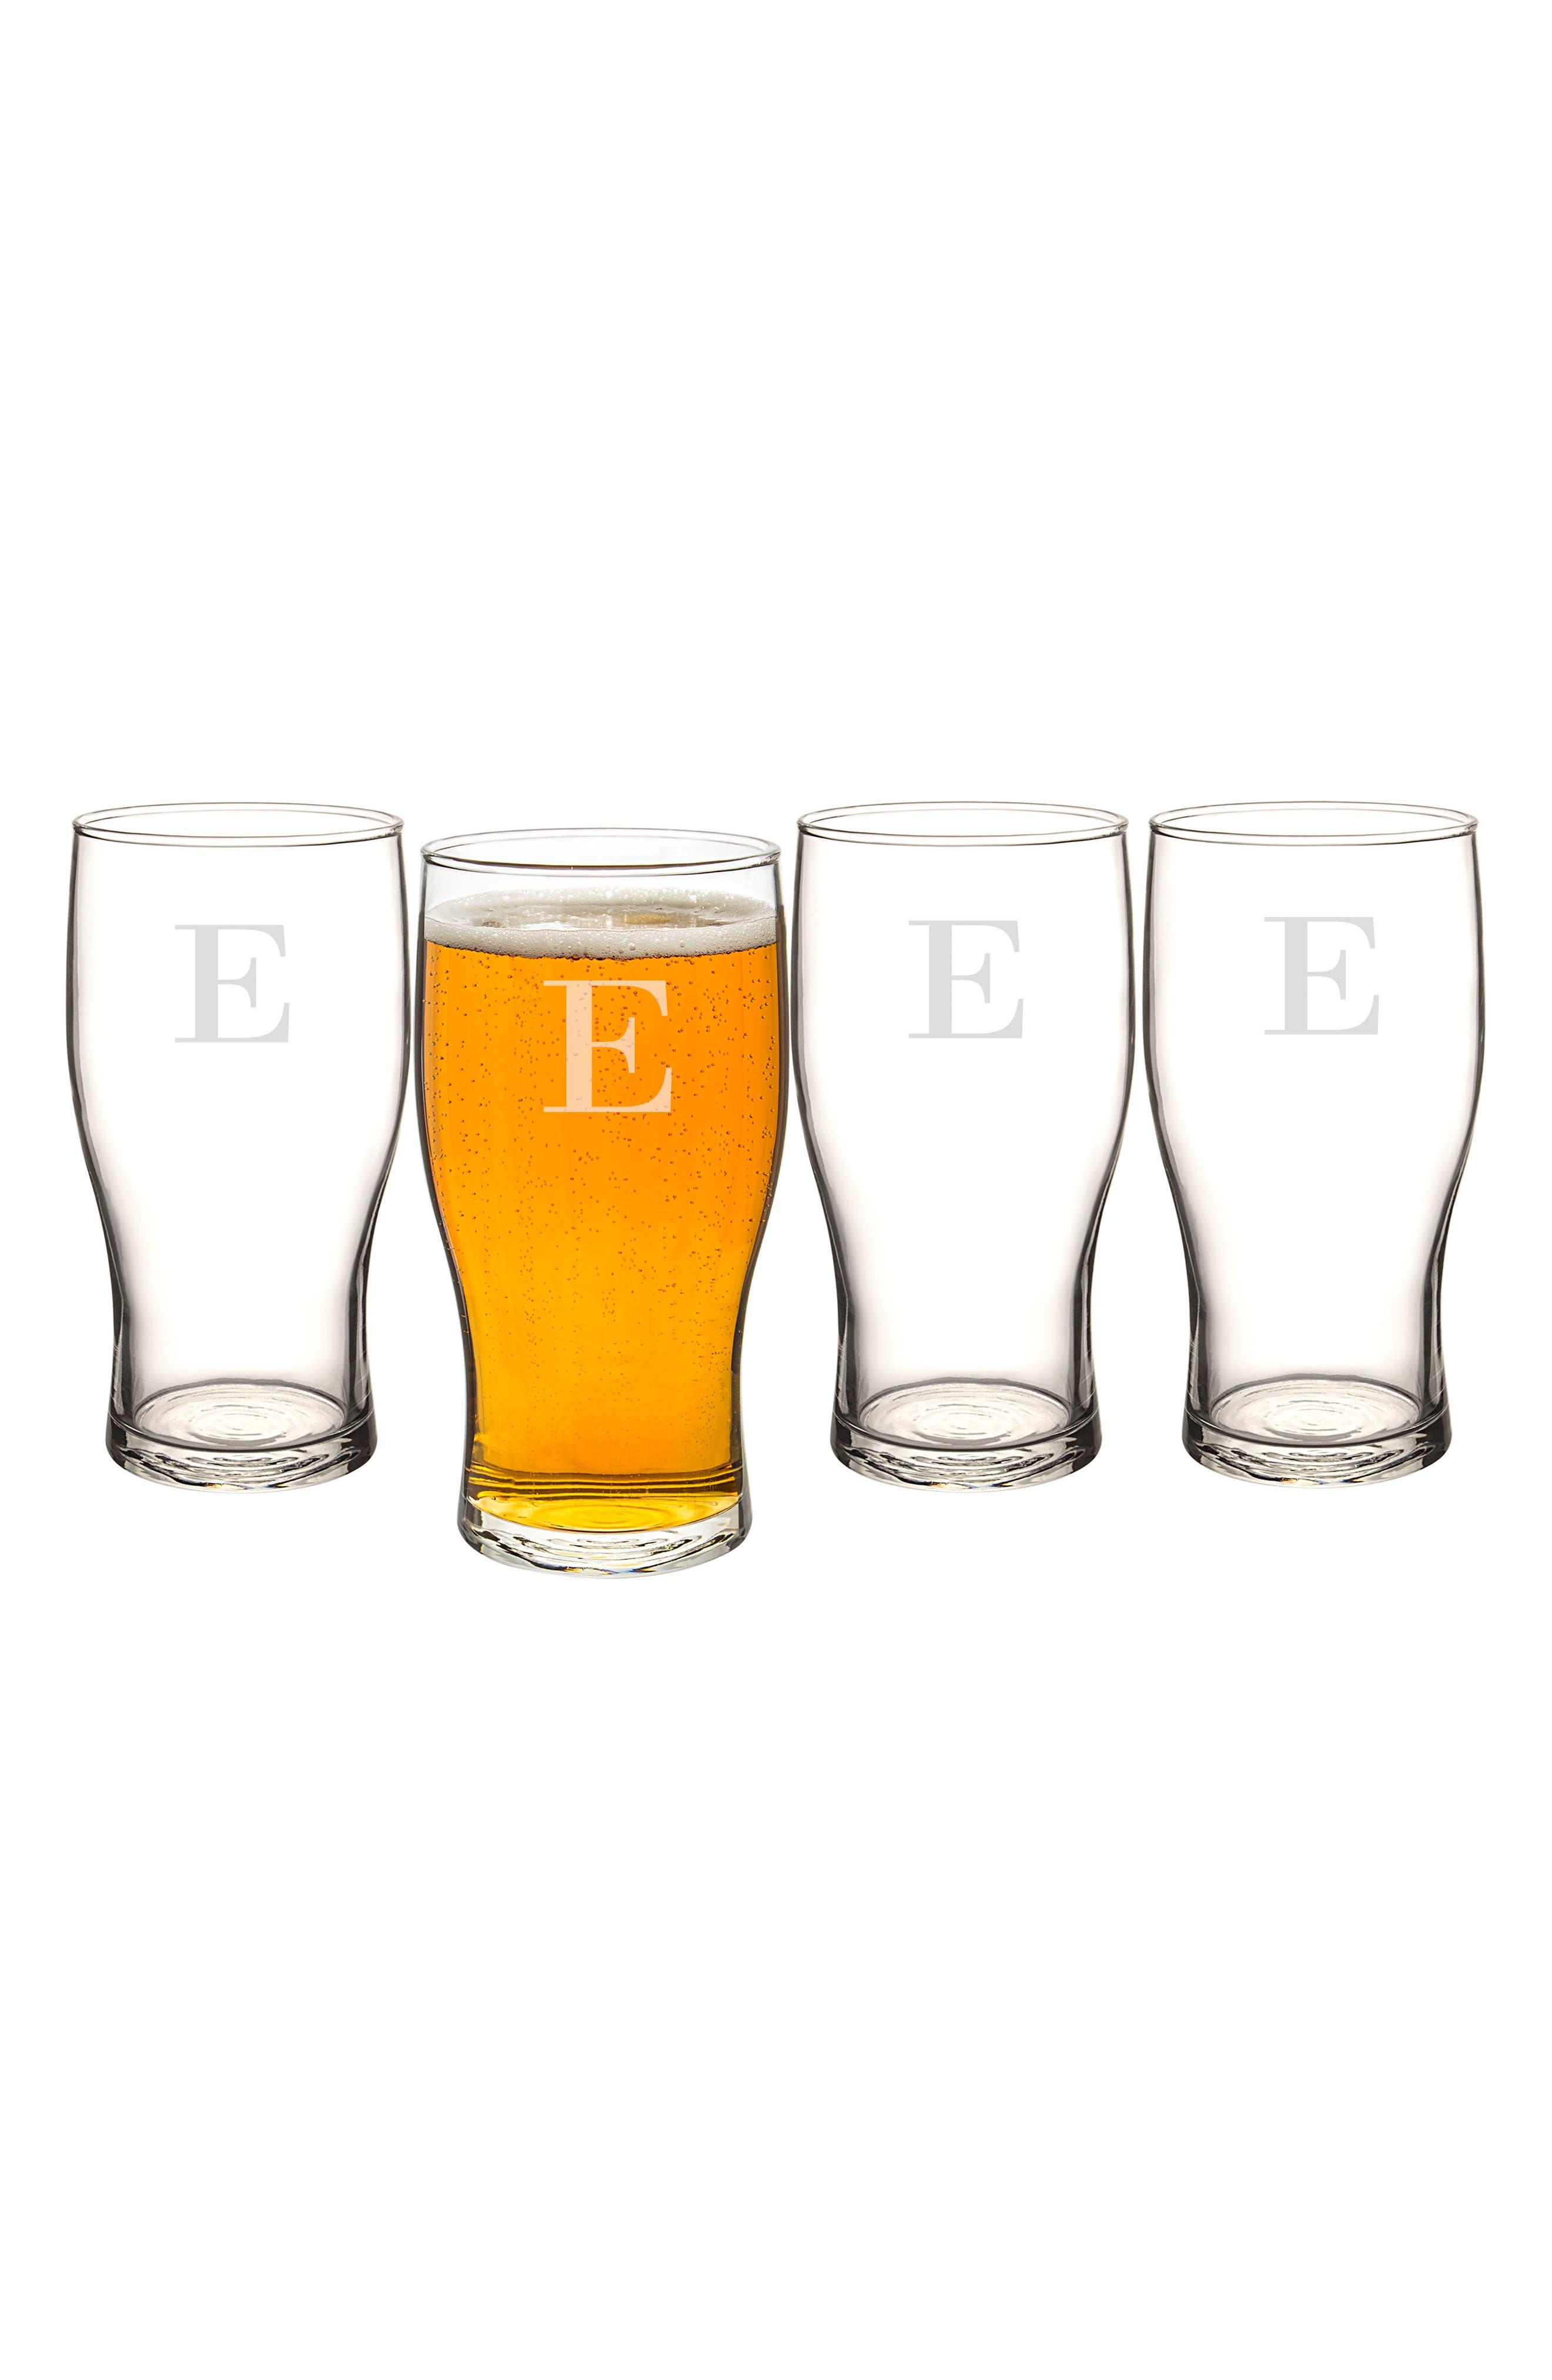 Monogram Set of 4 Pilsner Glasses,                             Main thumbnail 1, color,                             103